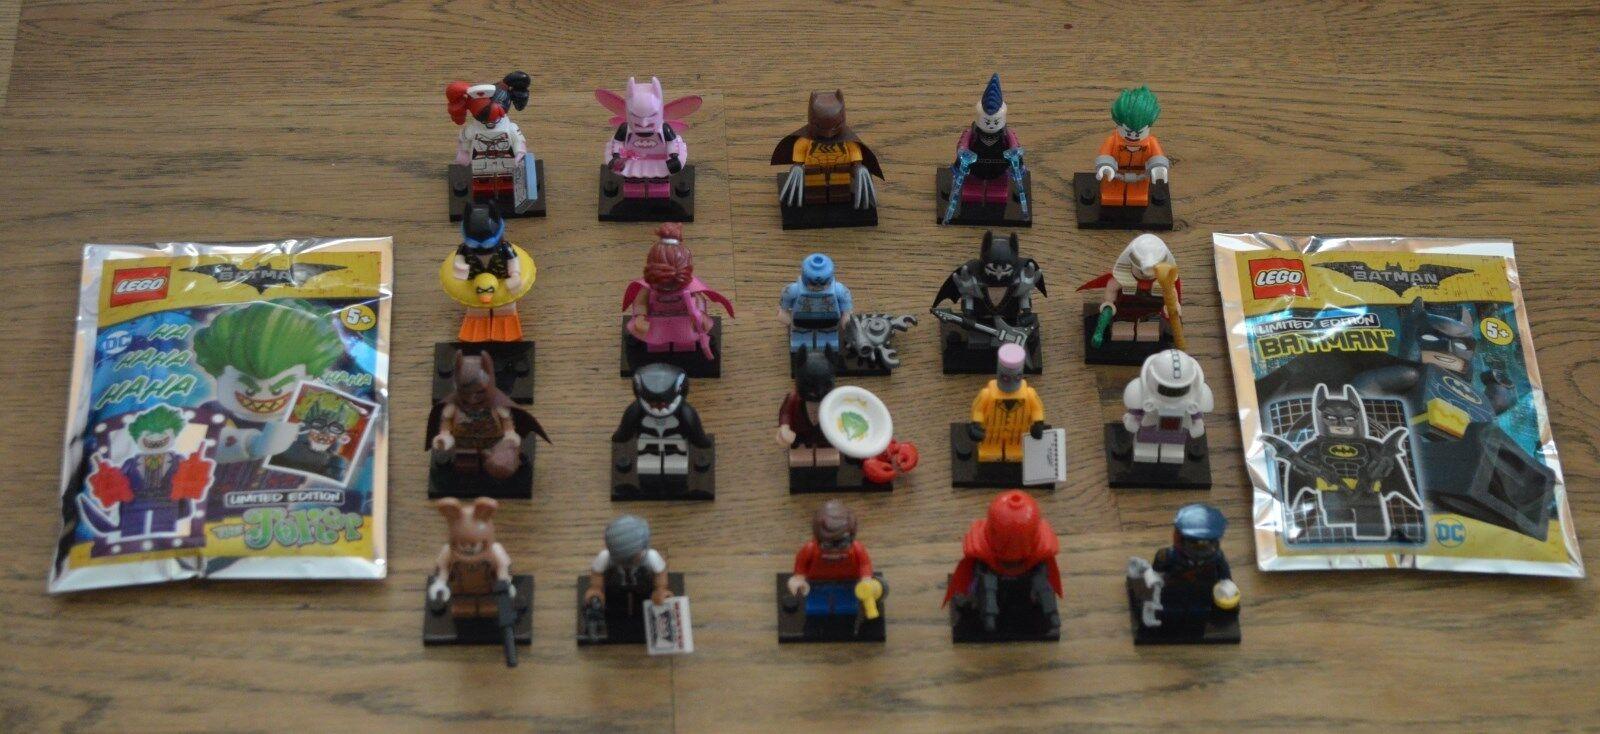 Lego 71017 Mini Figurines the Batman Movie Mini Figurine Limited Edition Select